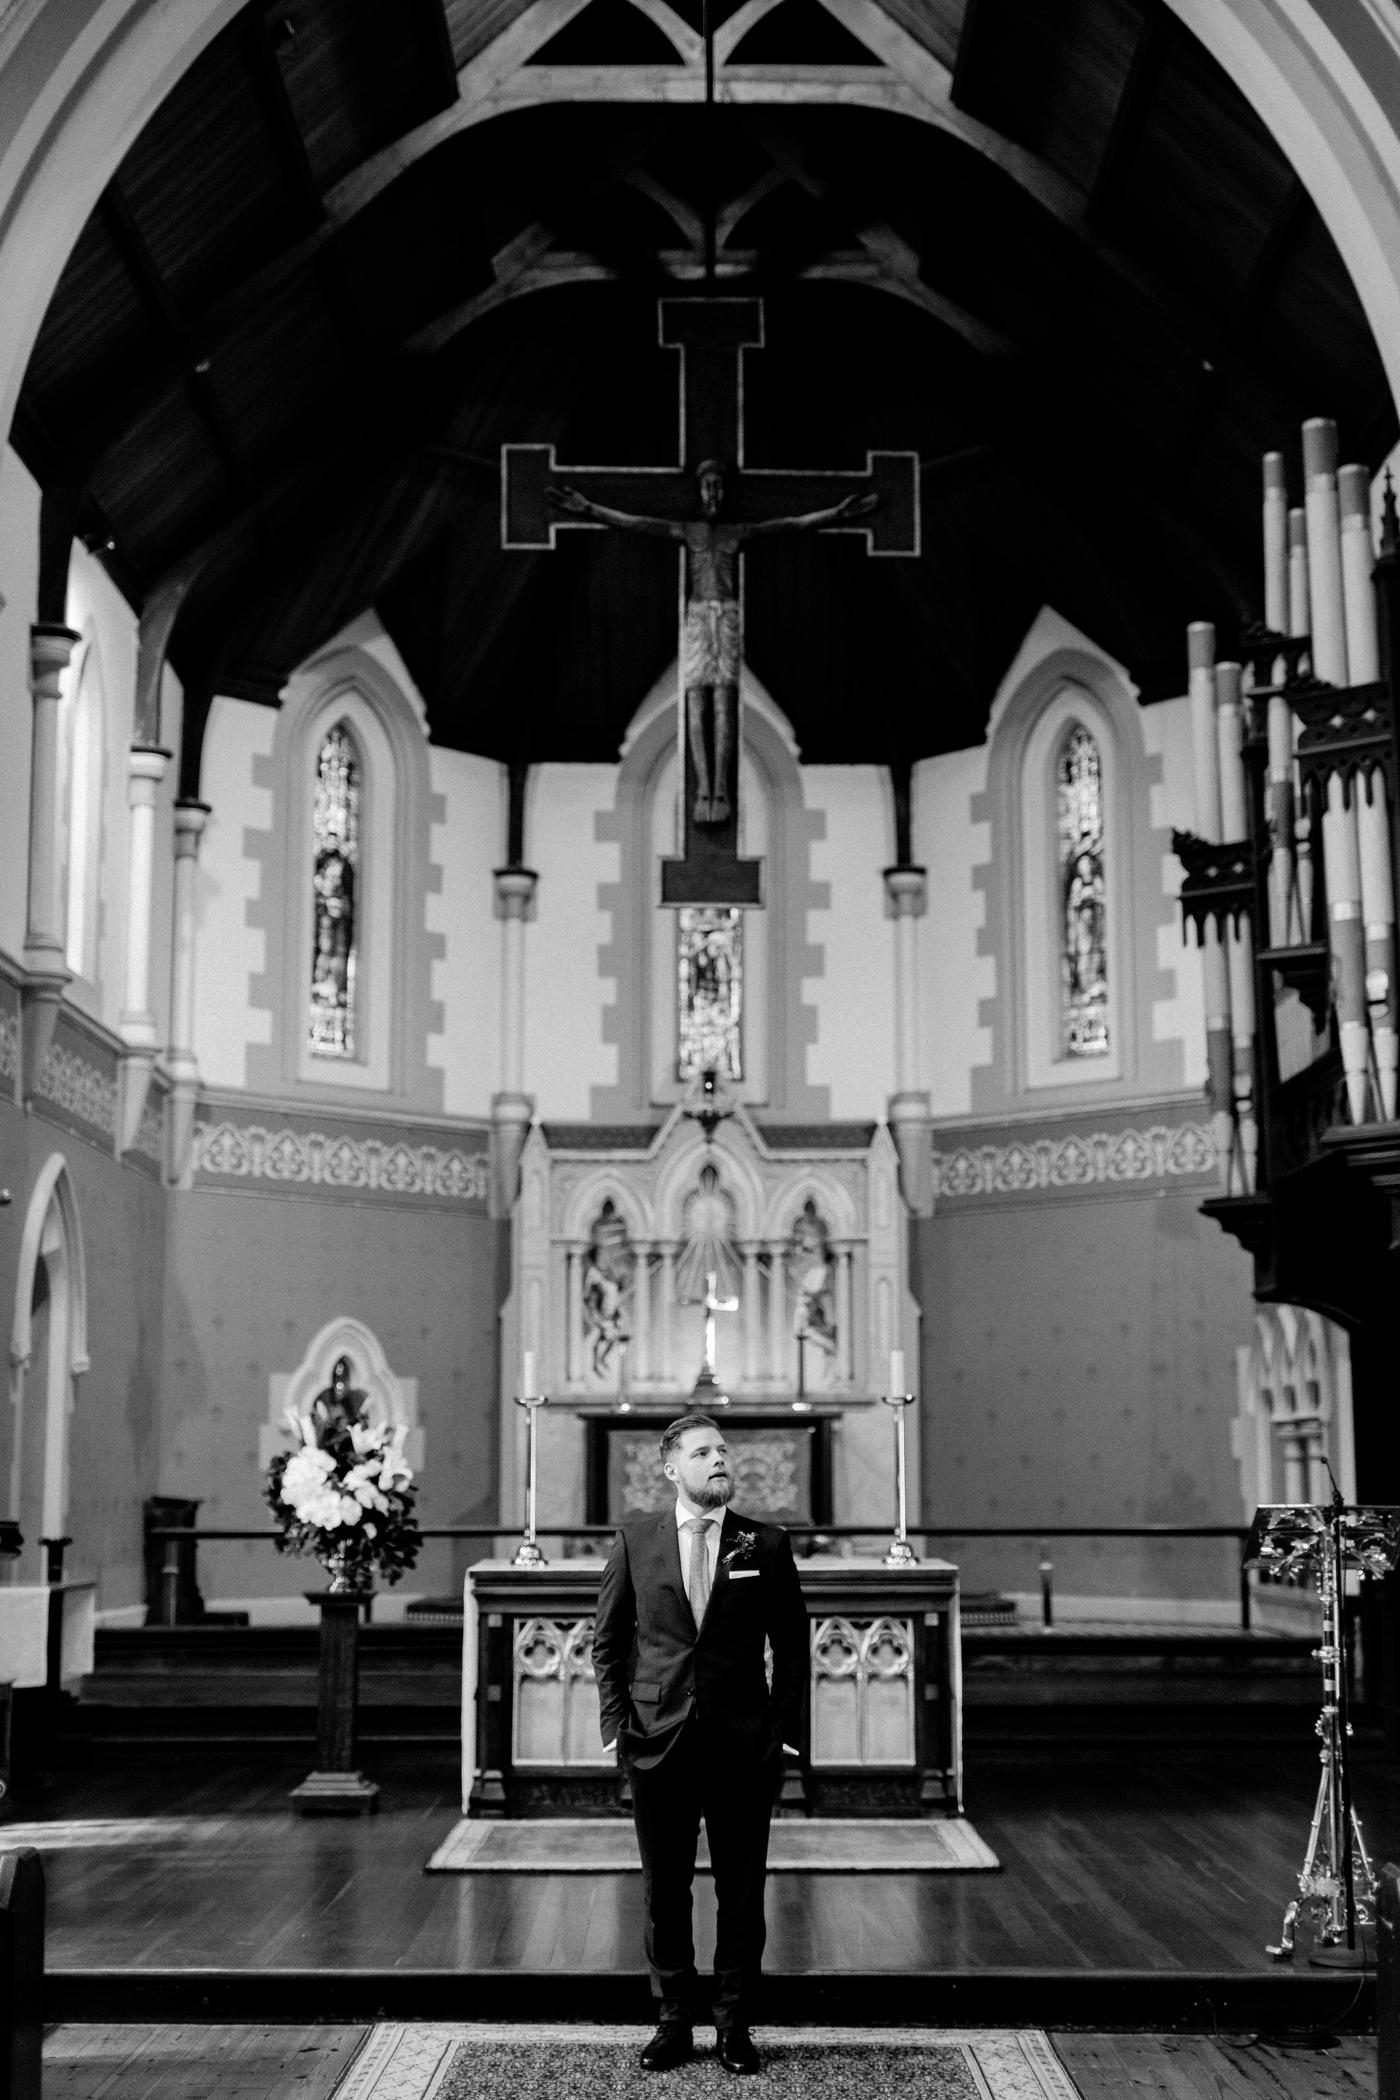 Erin & Ryan - Natural Wedding Photographer in Adelaide - Maximillians Wedding - Simple and Modern Wedding Photographer - Katherine Schultz - www.katherineschultzphotography.com_0007.jpg